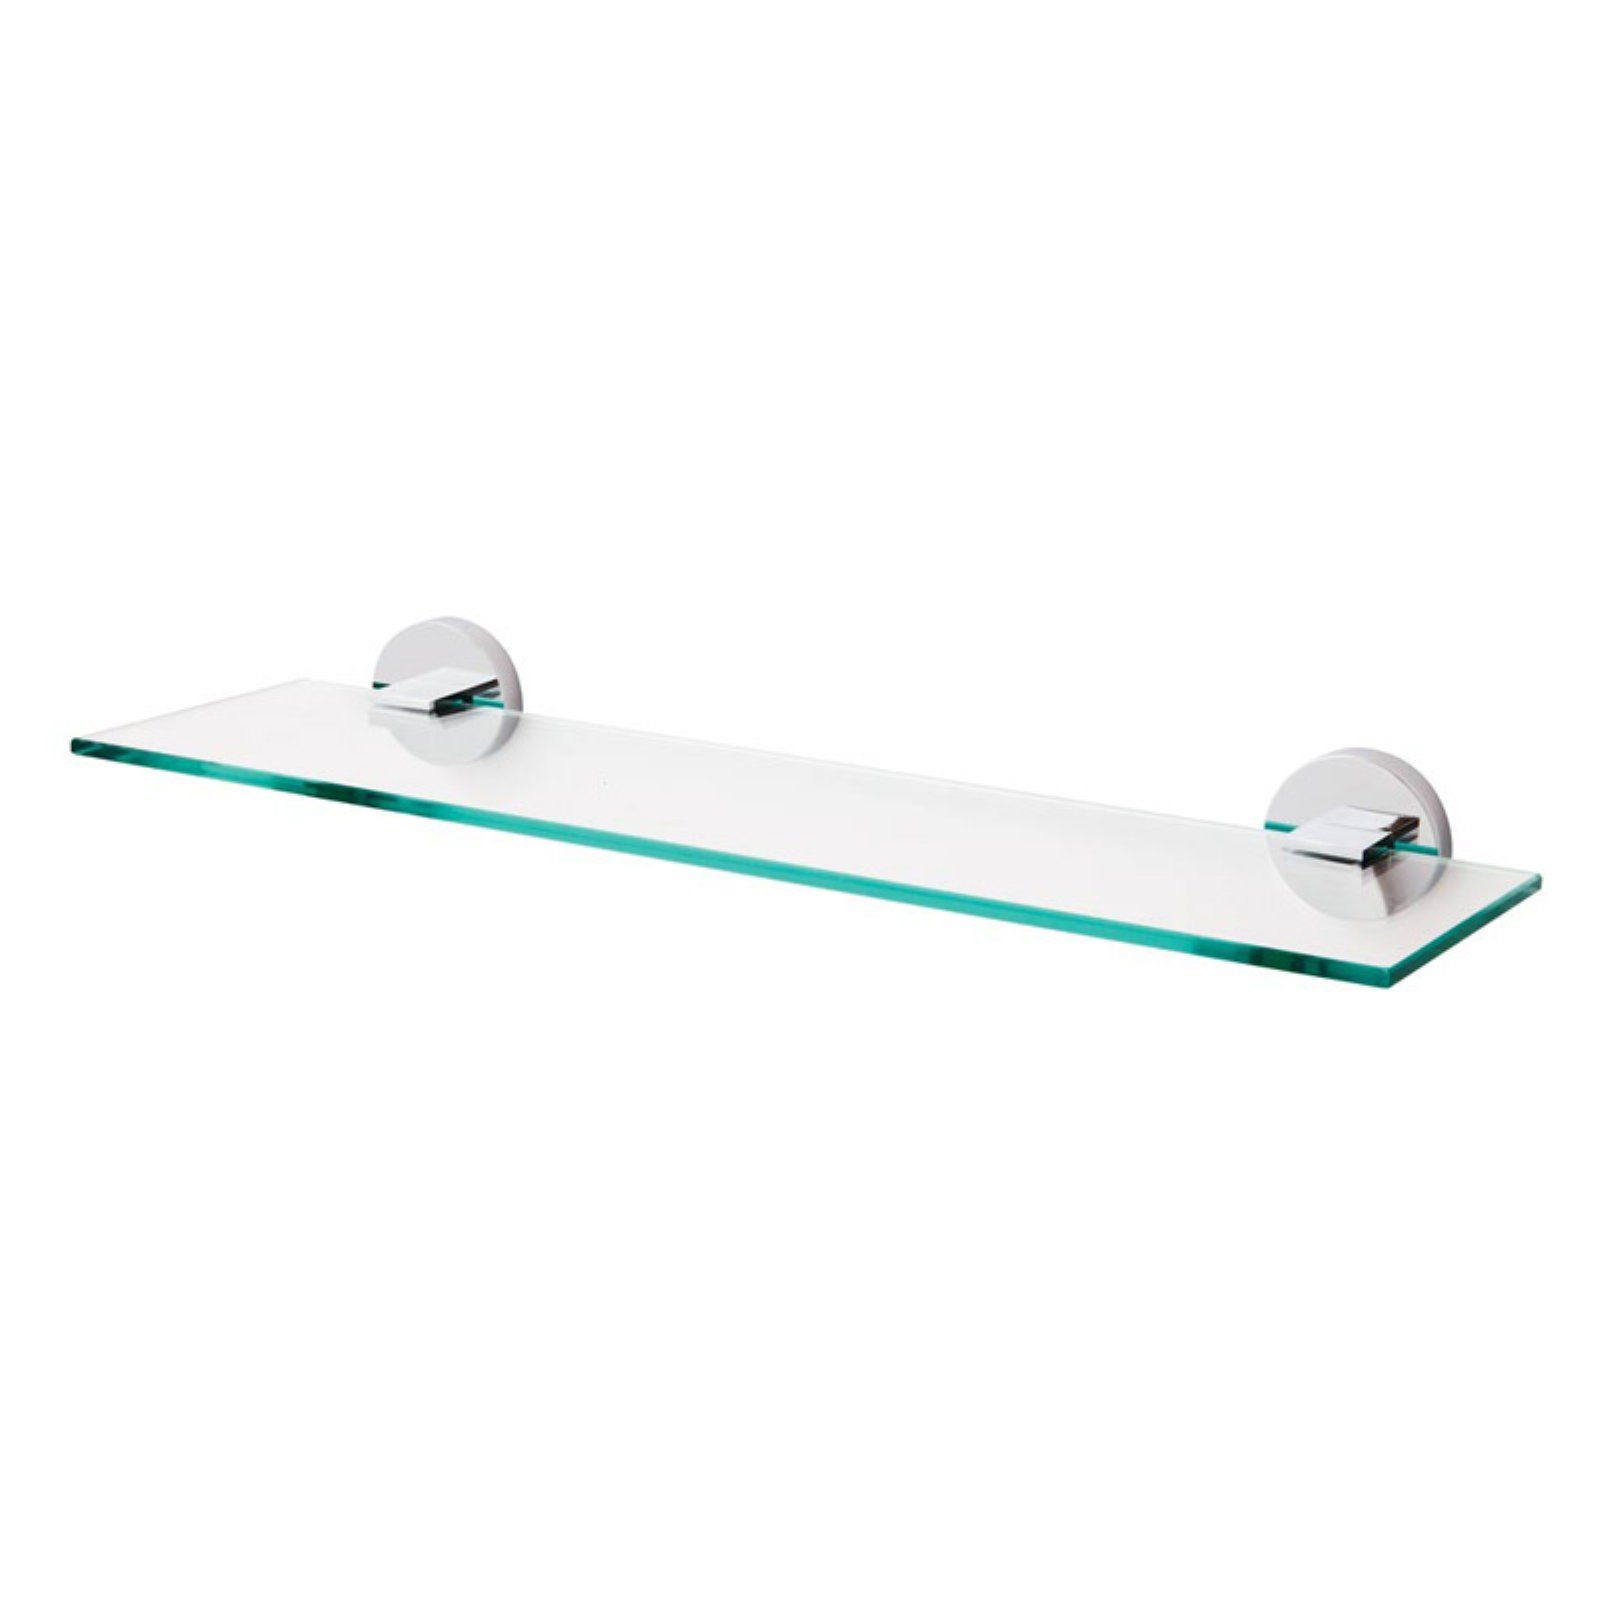 Speakman Neo Glass Shelf Glass Bathroom Shelves Glass Bathroom